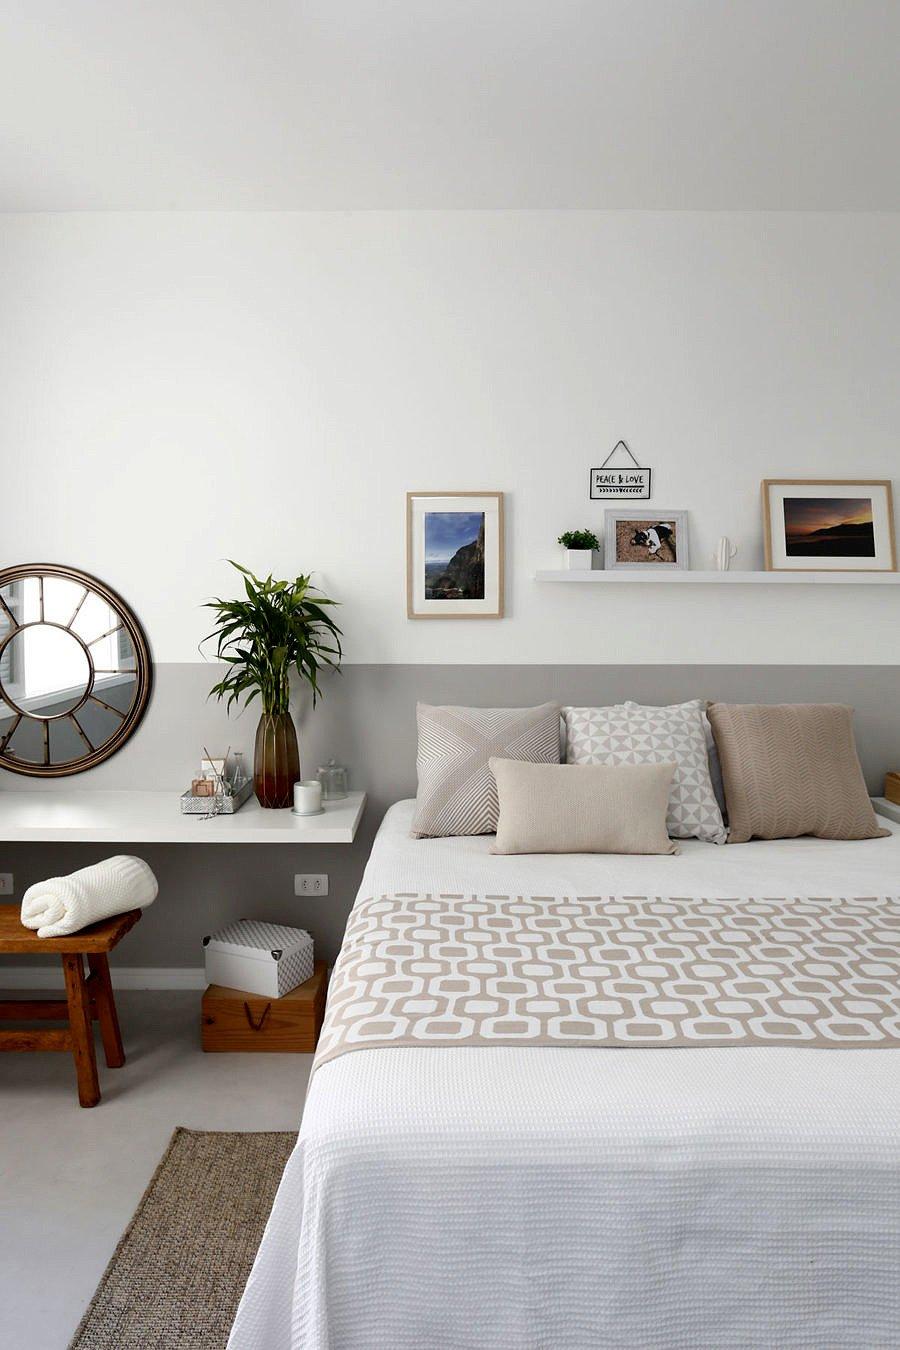 JMA-Estudio-projetos-apartamento-18-900x1350